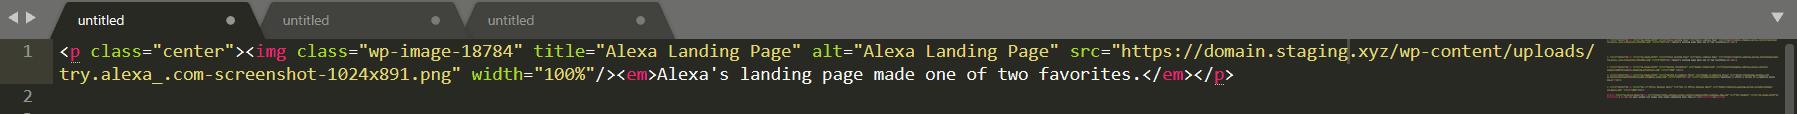 IMG Code Example